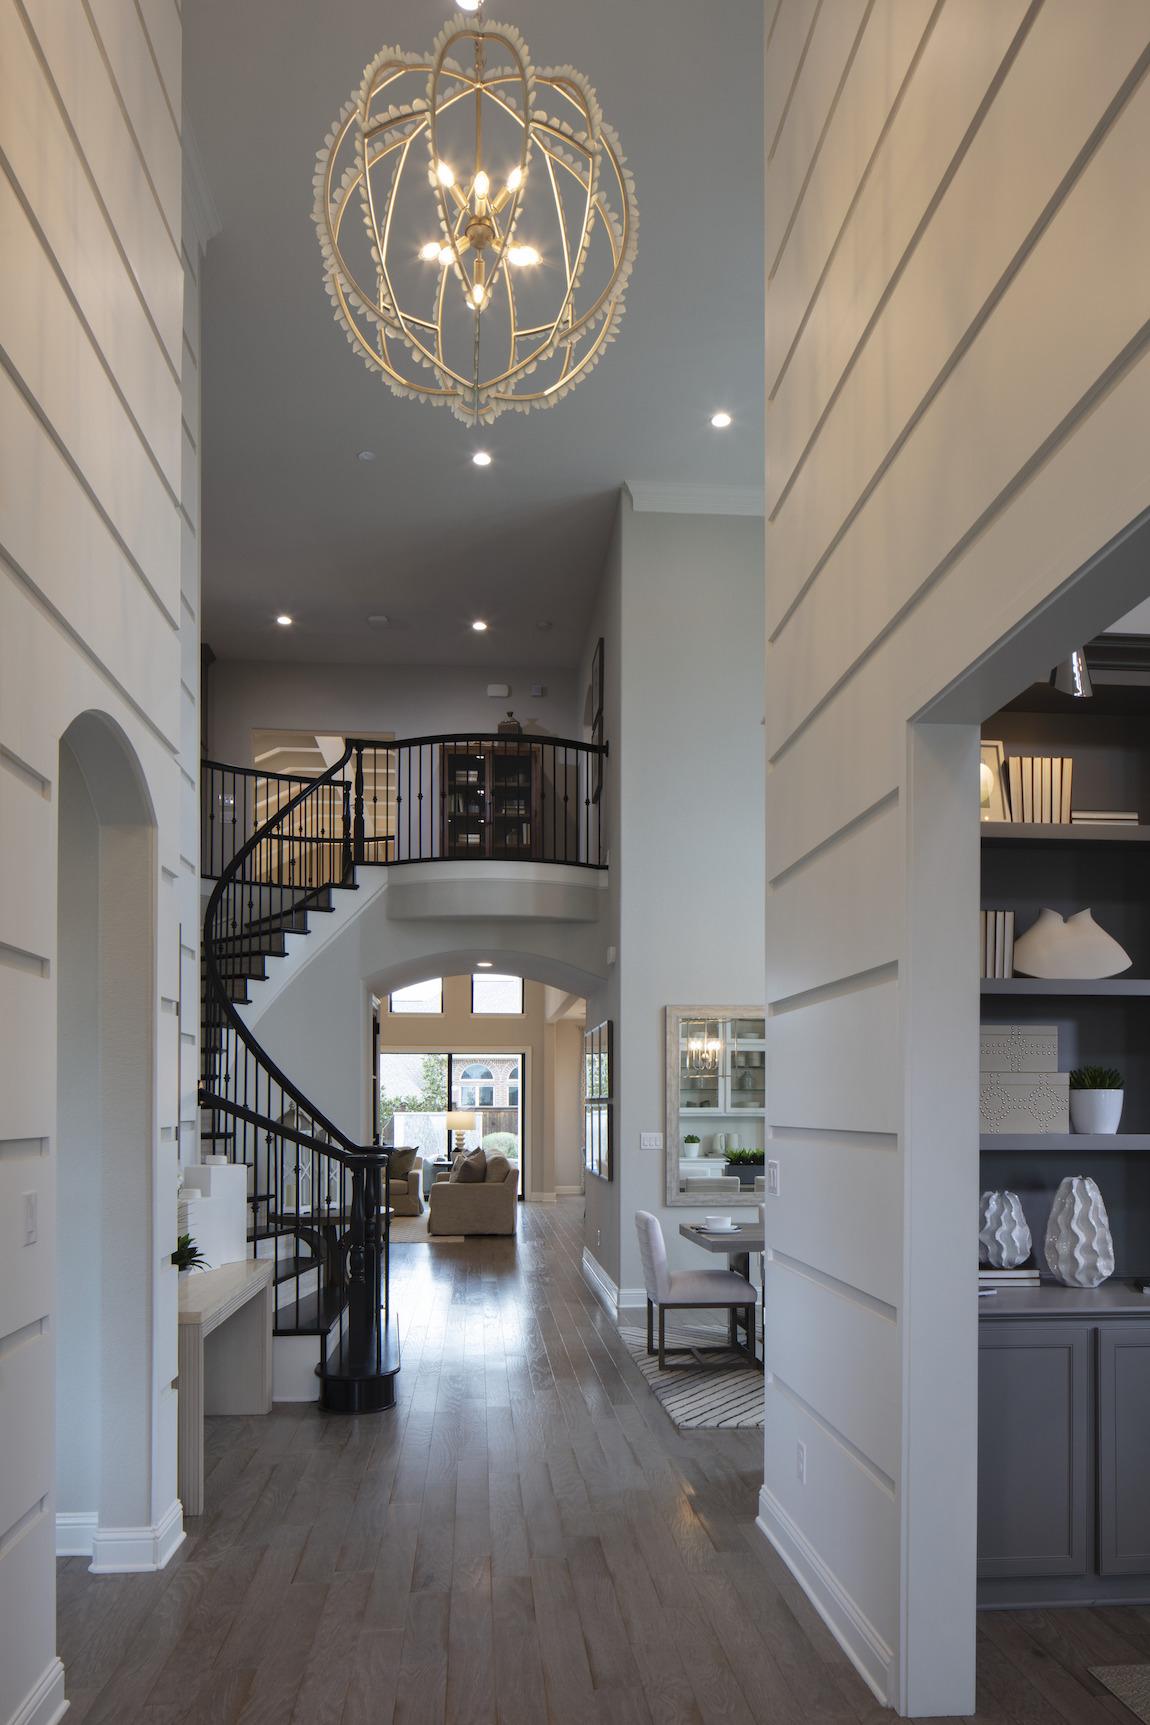 Decorative caged chandelier in foyer